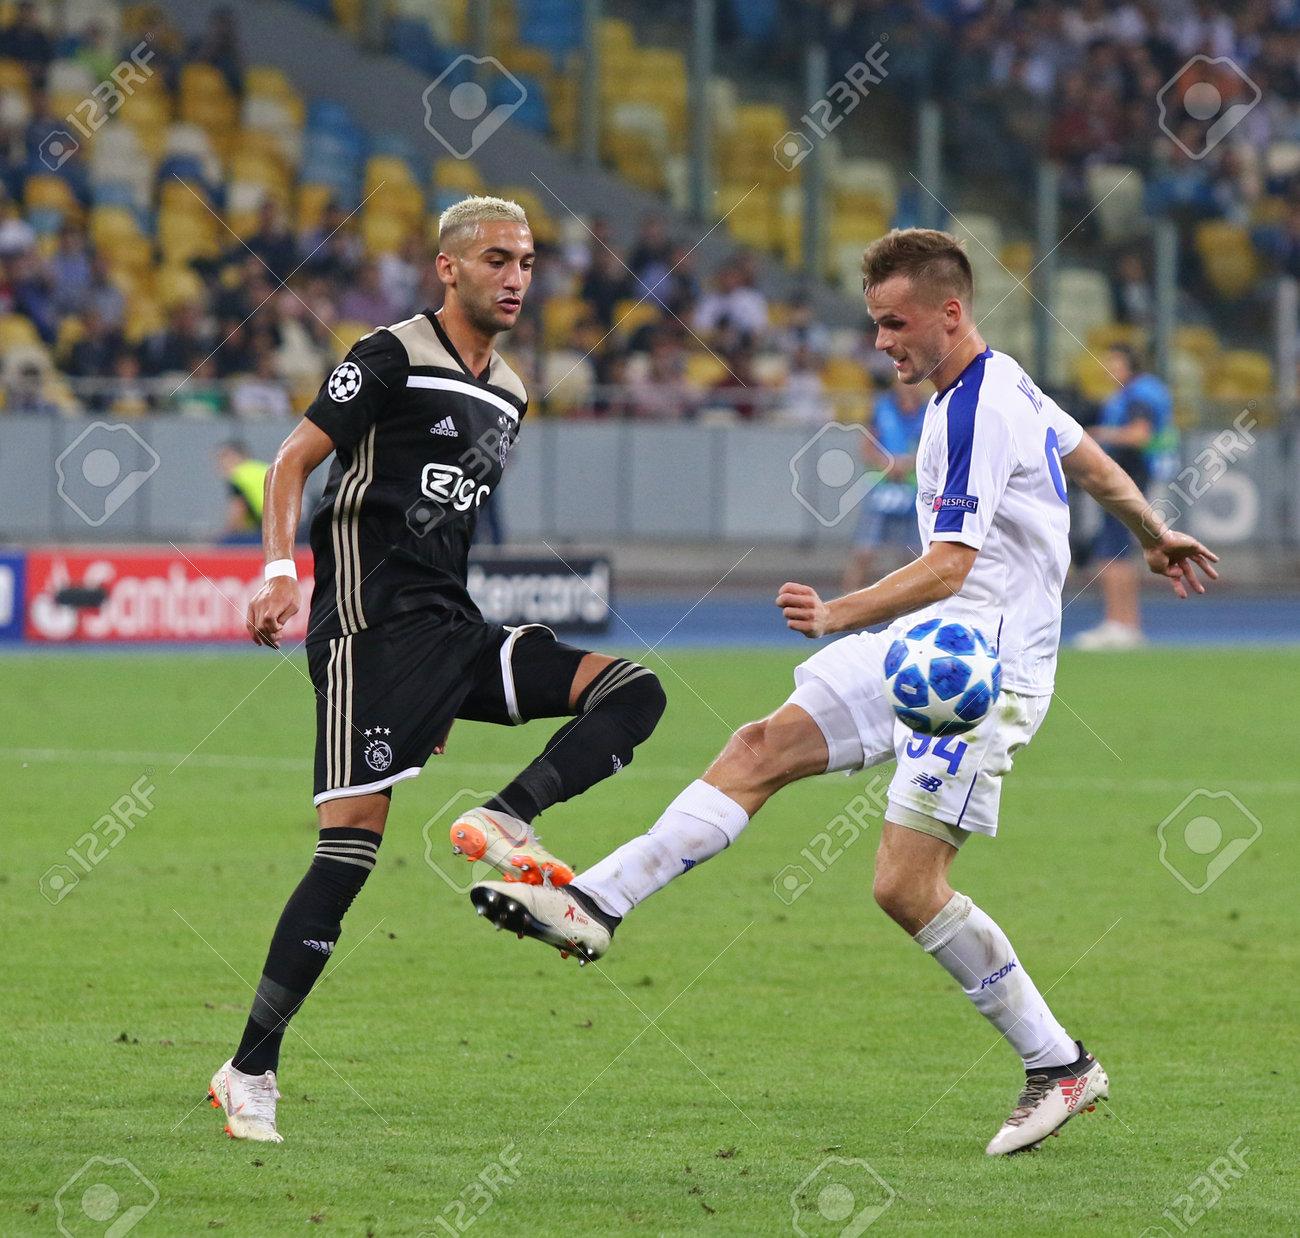 KYIV, UKRAINE - AUGUST 28, 2018: Hakim Ziyech of AFC Ajax (L)